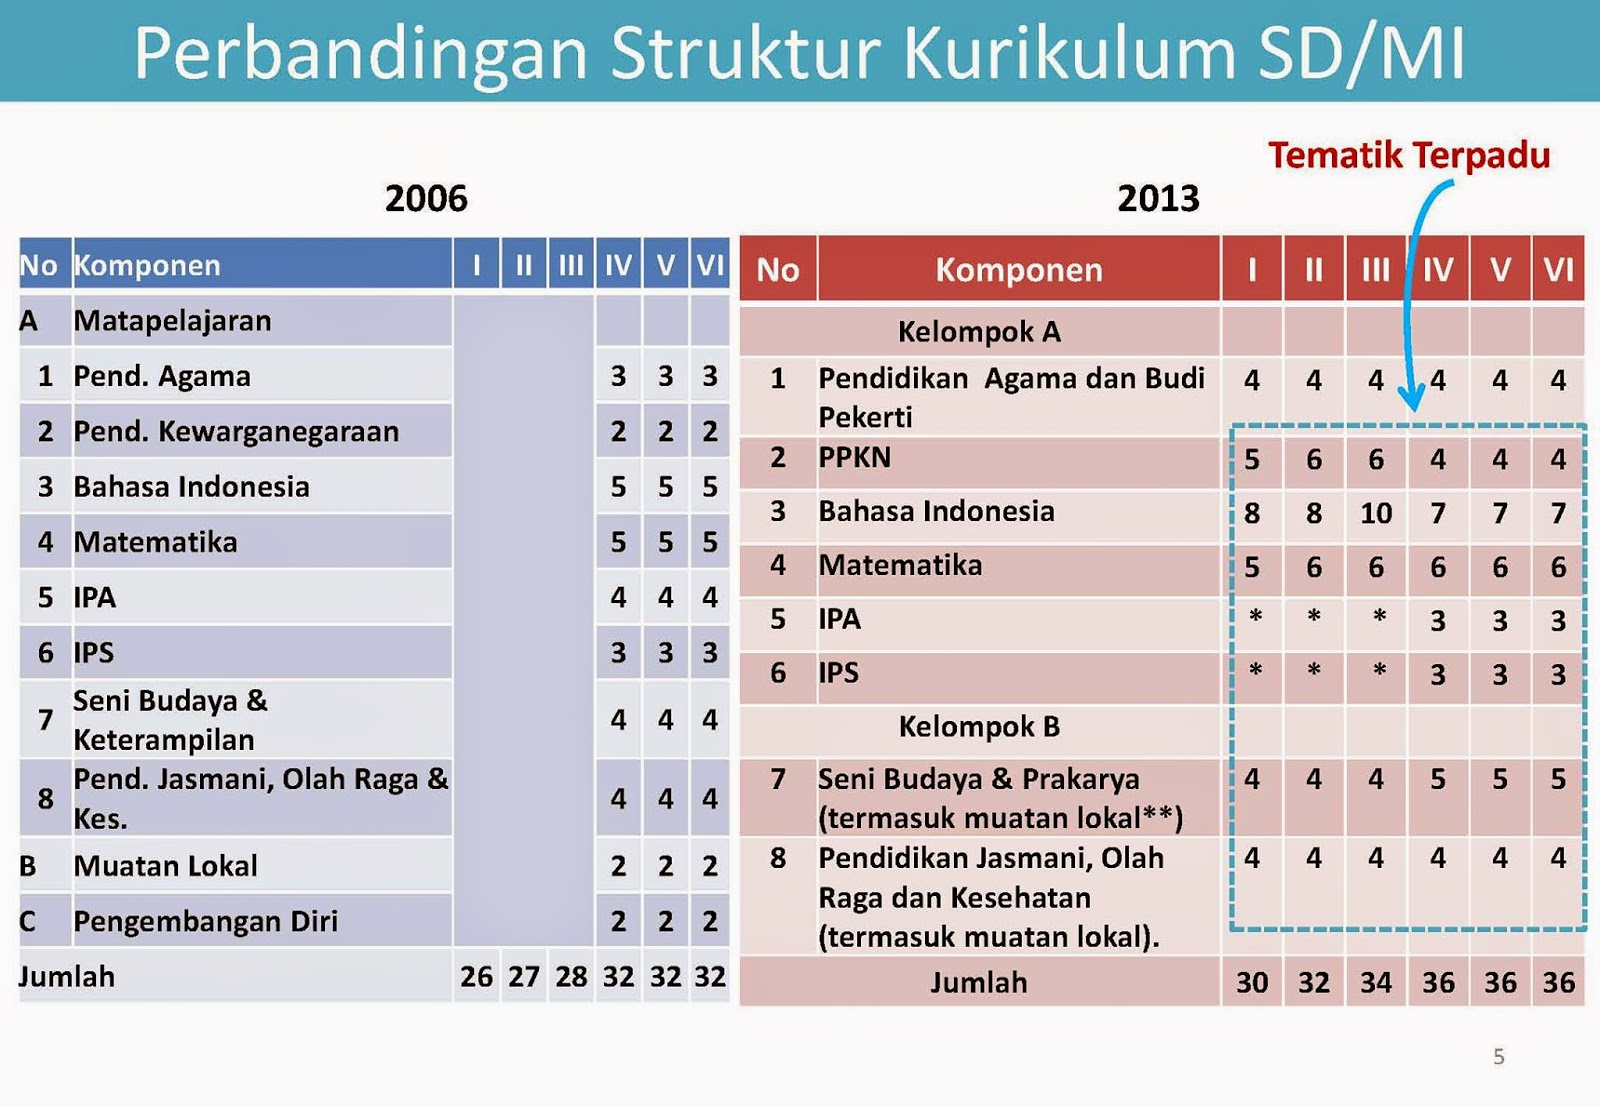 Rpp Bahasa Indonesia Pelajaran 2 Smk Kurikulum 2013 Rpp Bahasa Indonesia Kurikulum 2013 Slideshare Kurikulum 2013 Blog Tentang Pendidikan Artikel Dan Share The